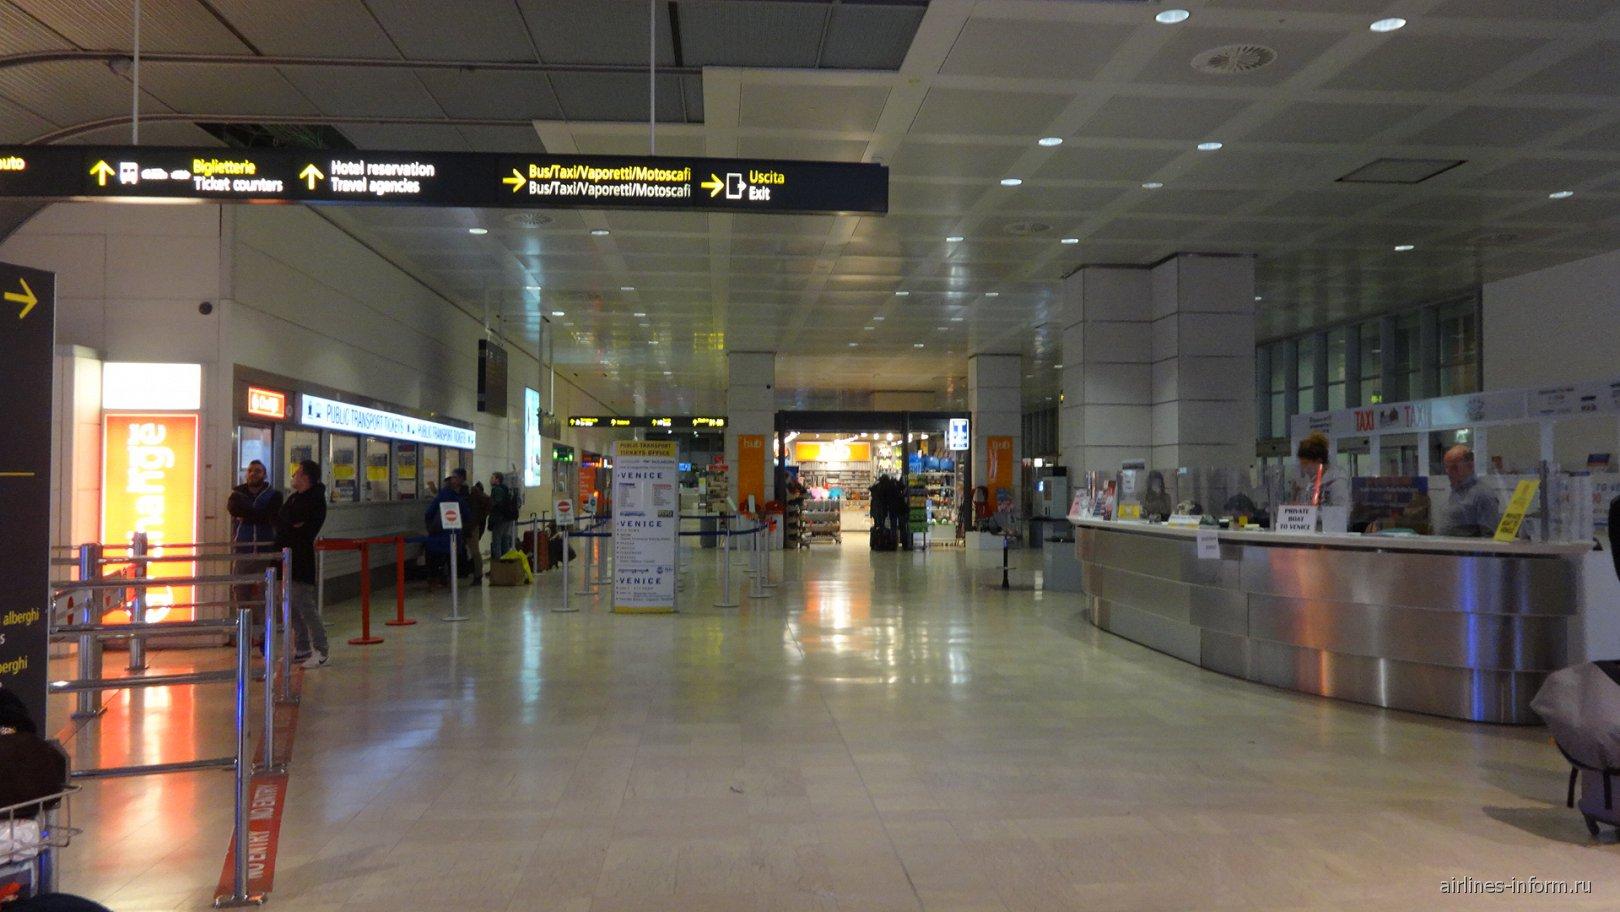 Зал прилета в аэропорту Венеция Марко Поло